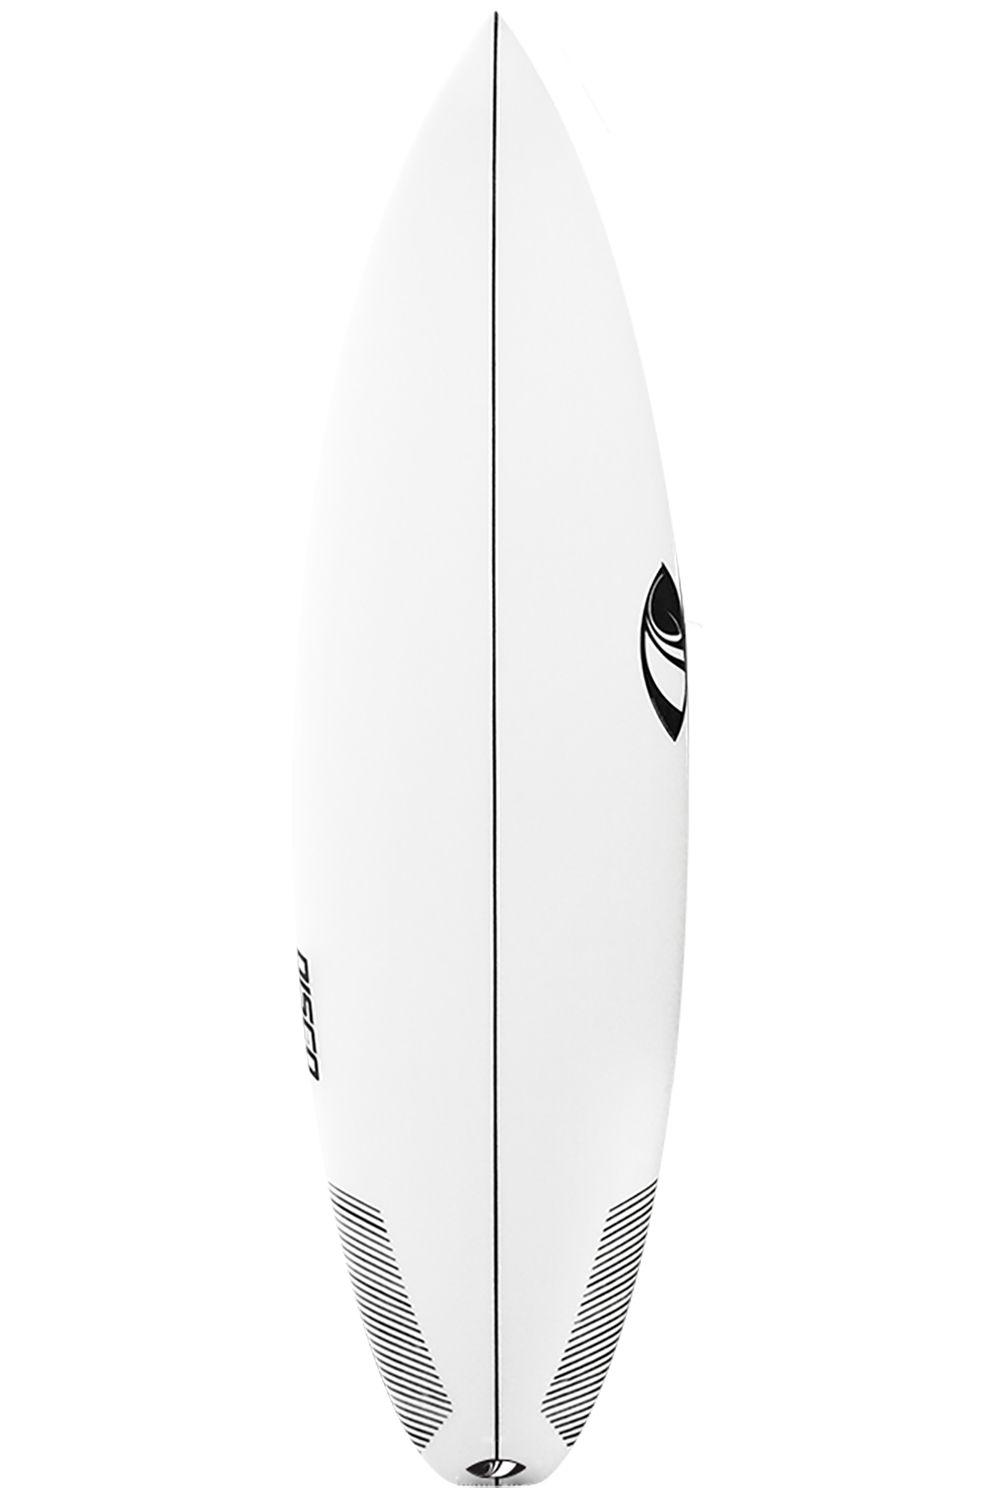 Sharpeye Surf Board 5'6 DISCO Squash Tail - White FCS II 5ft6